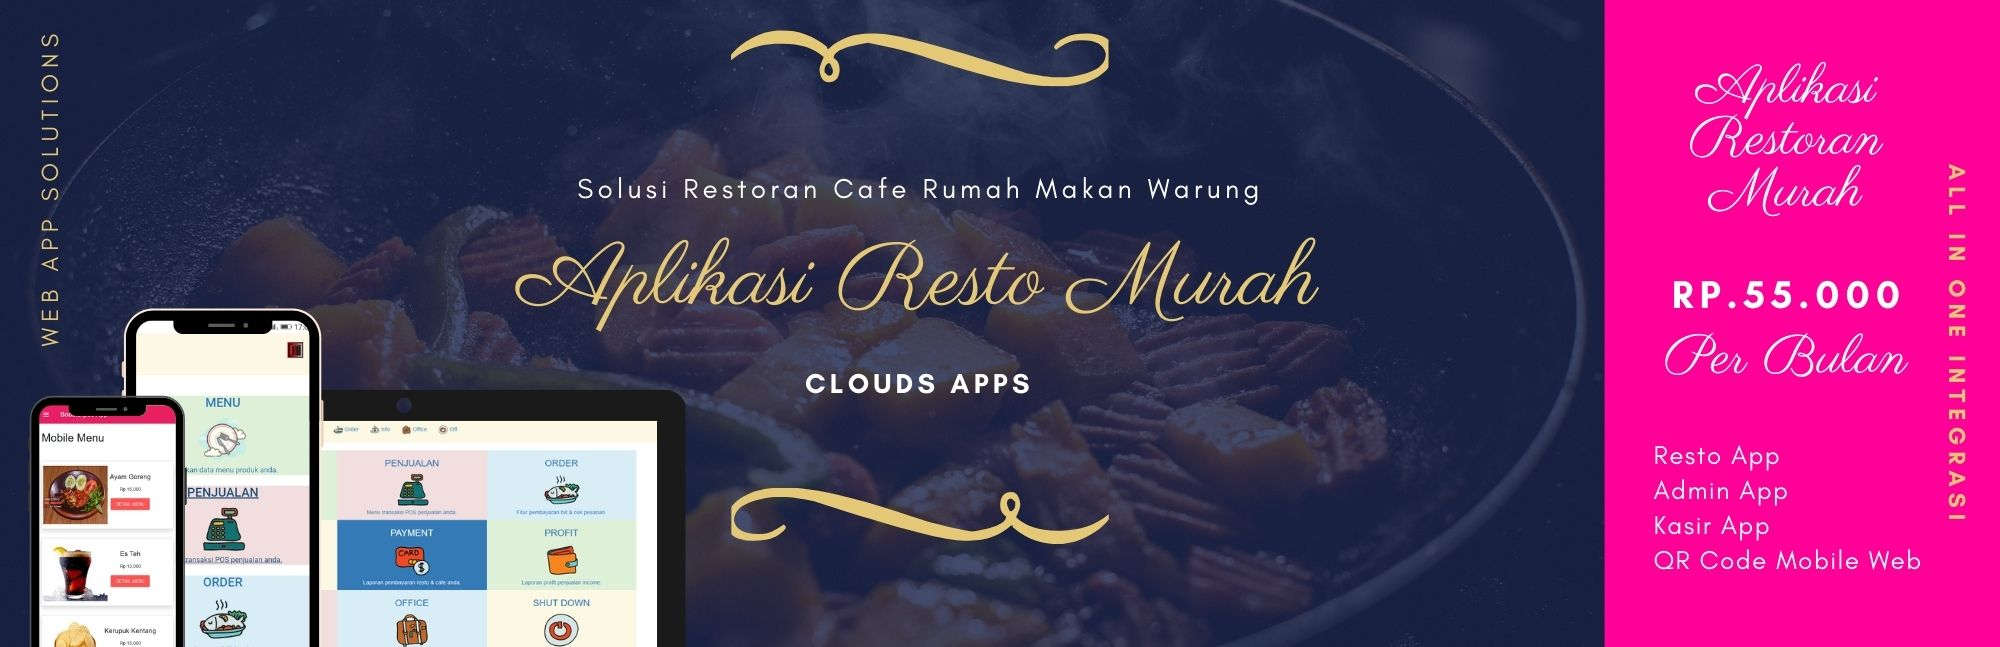 whatsapp order qrcode menu digital restoran